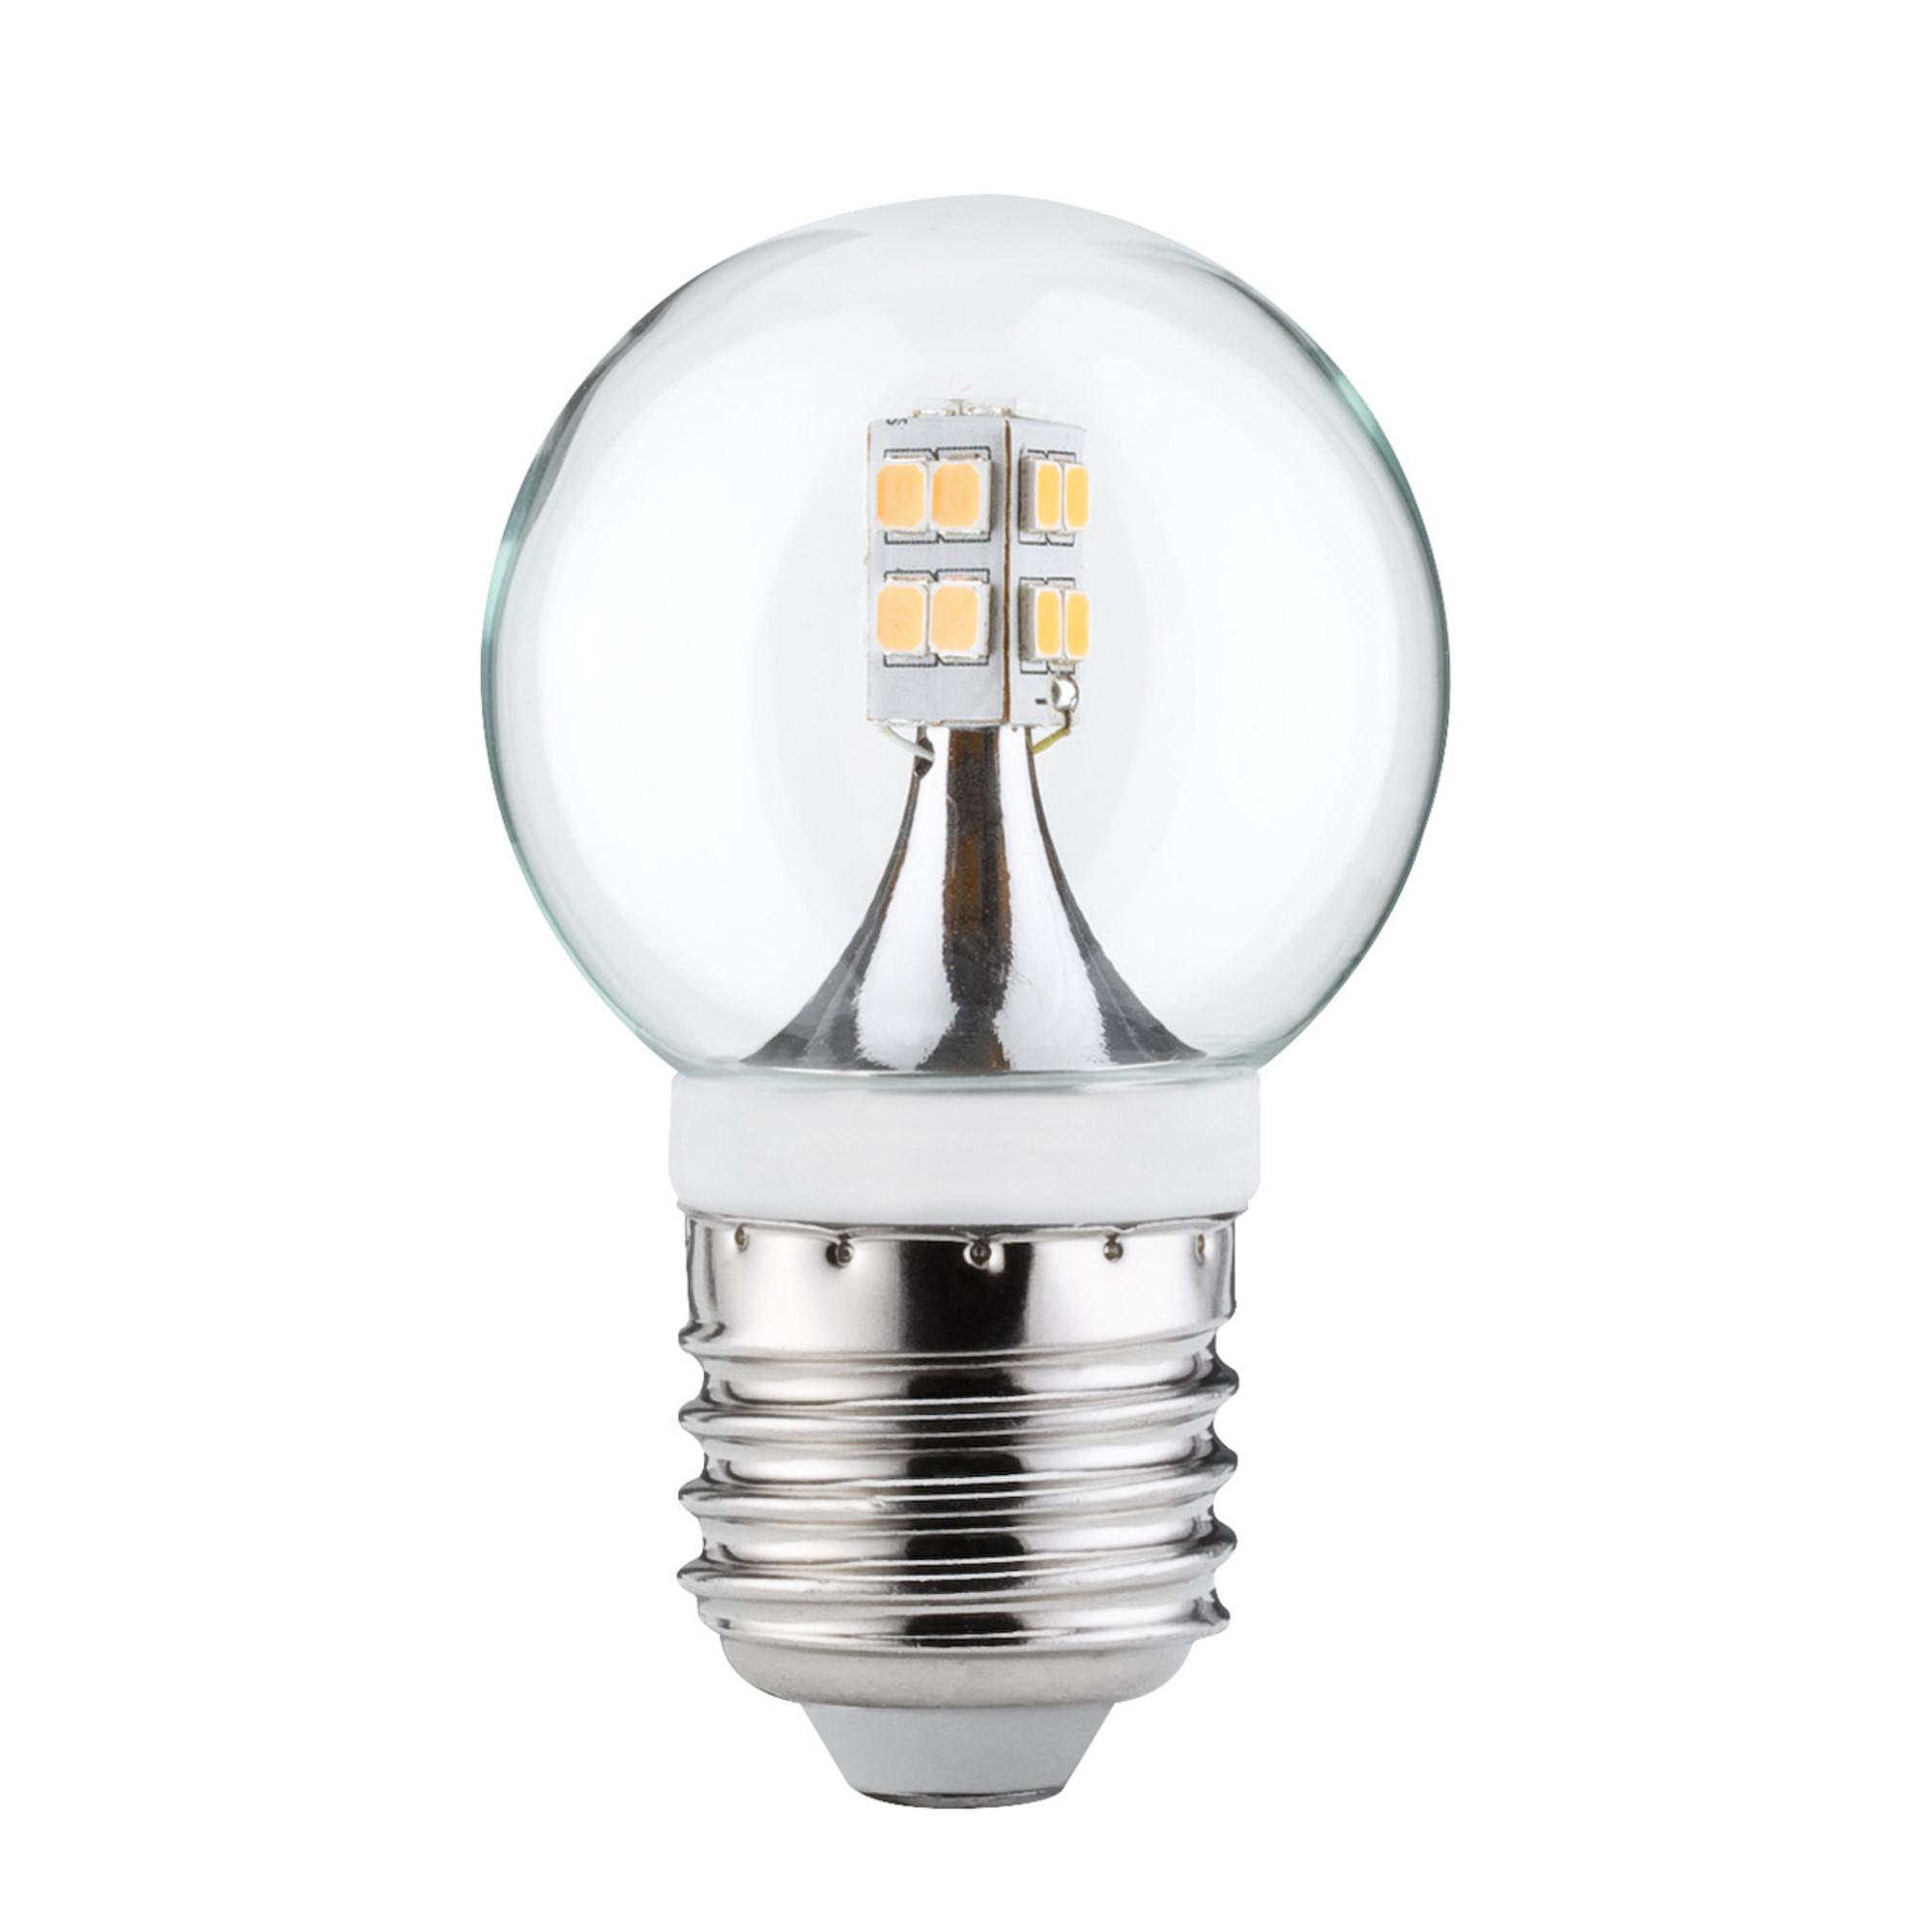 Лампа светодиодная Paulmann 28263 E27 200 Лм теплый свет